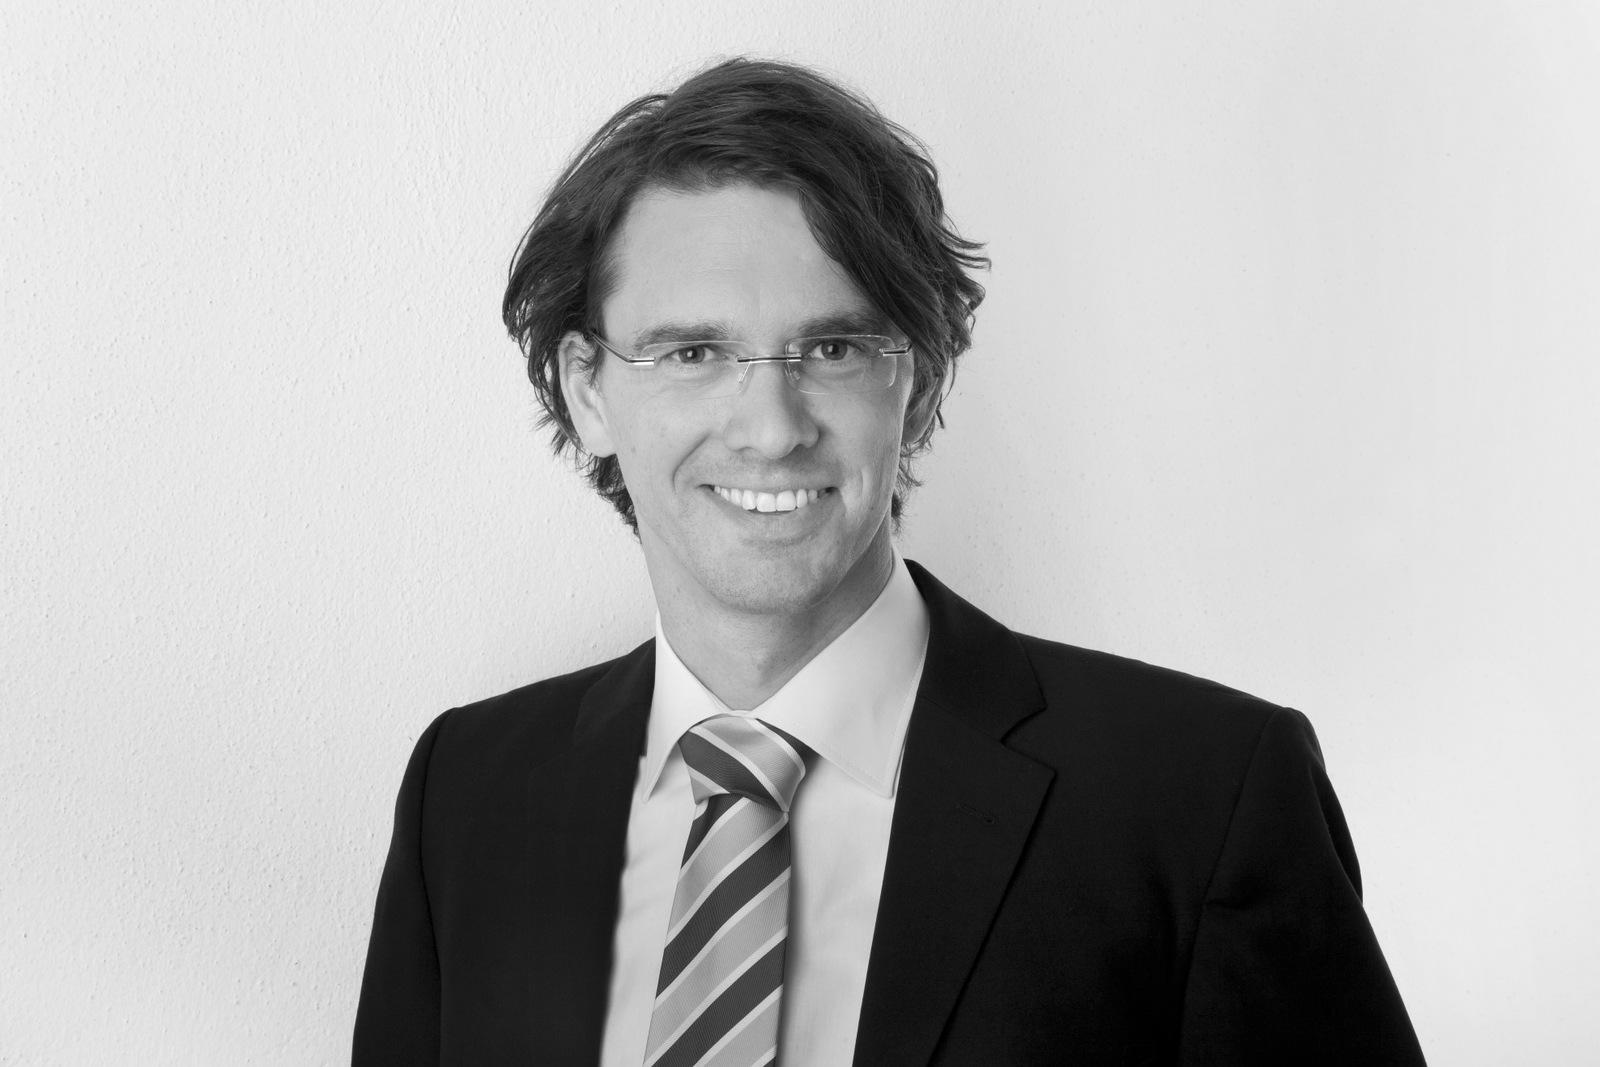 Dr.-Ing. Michael Bach